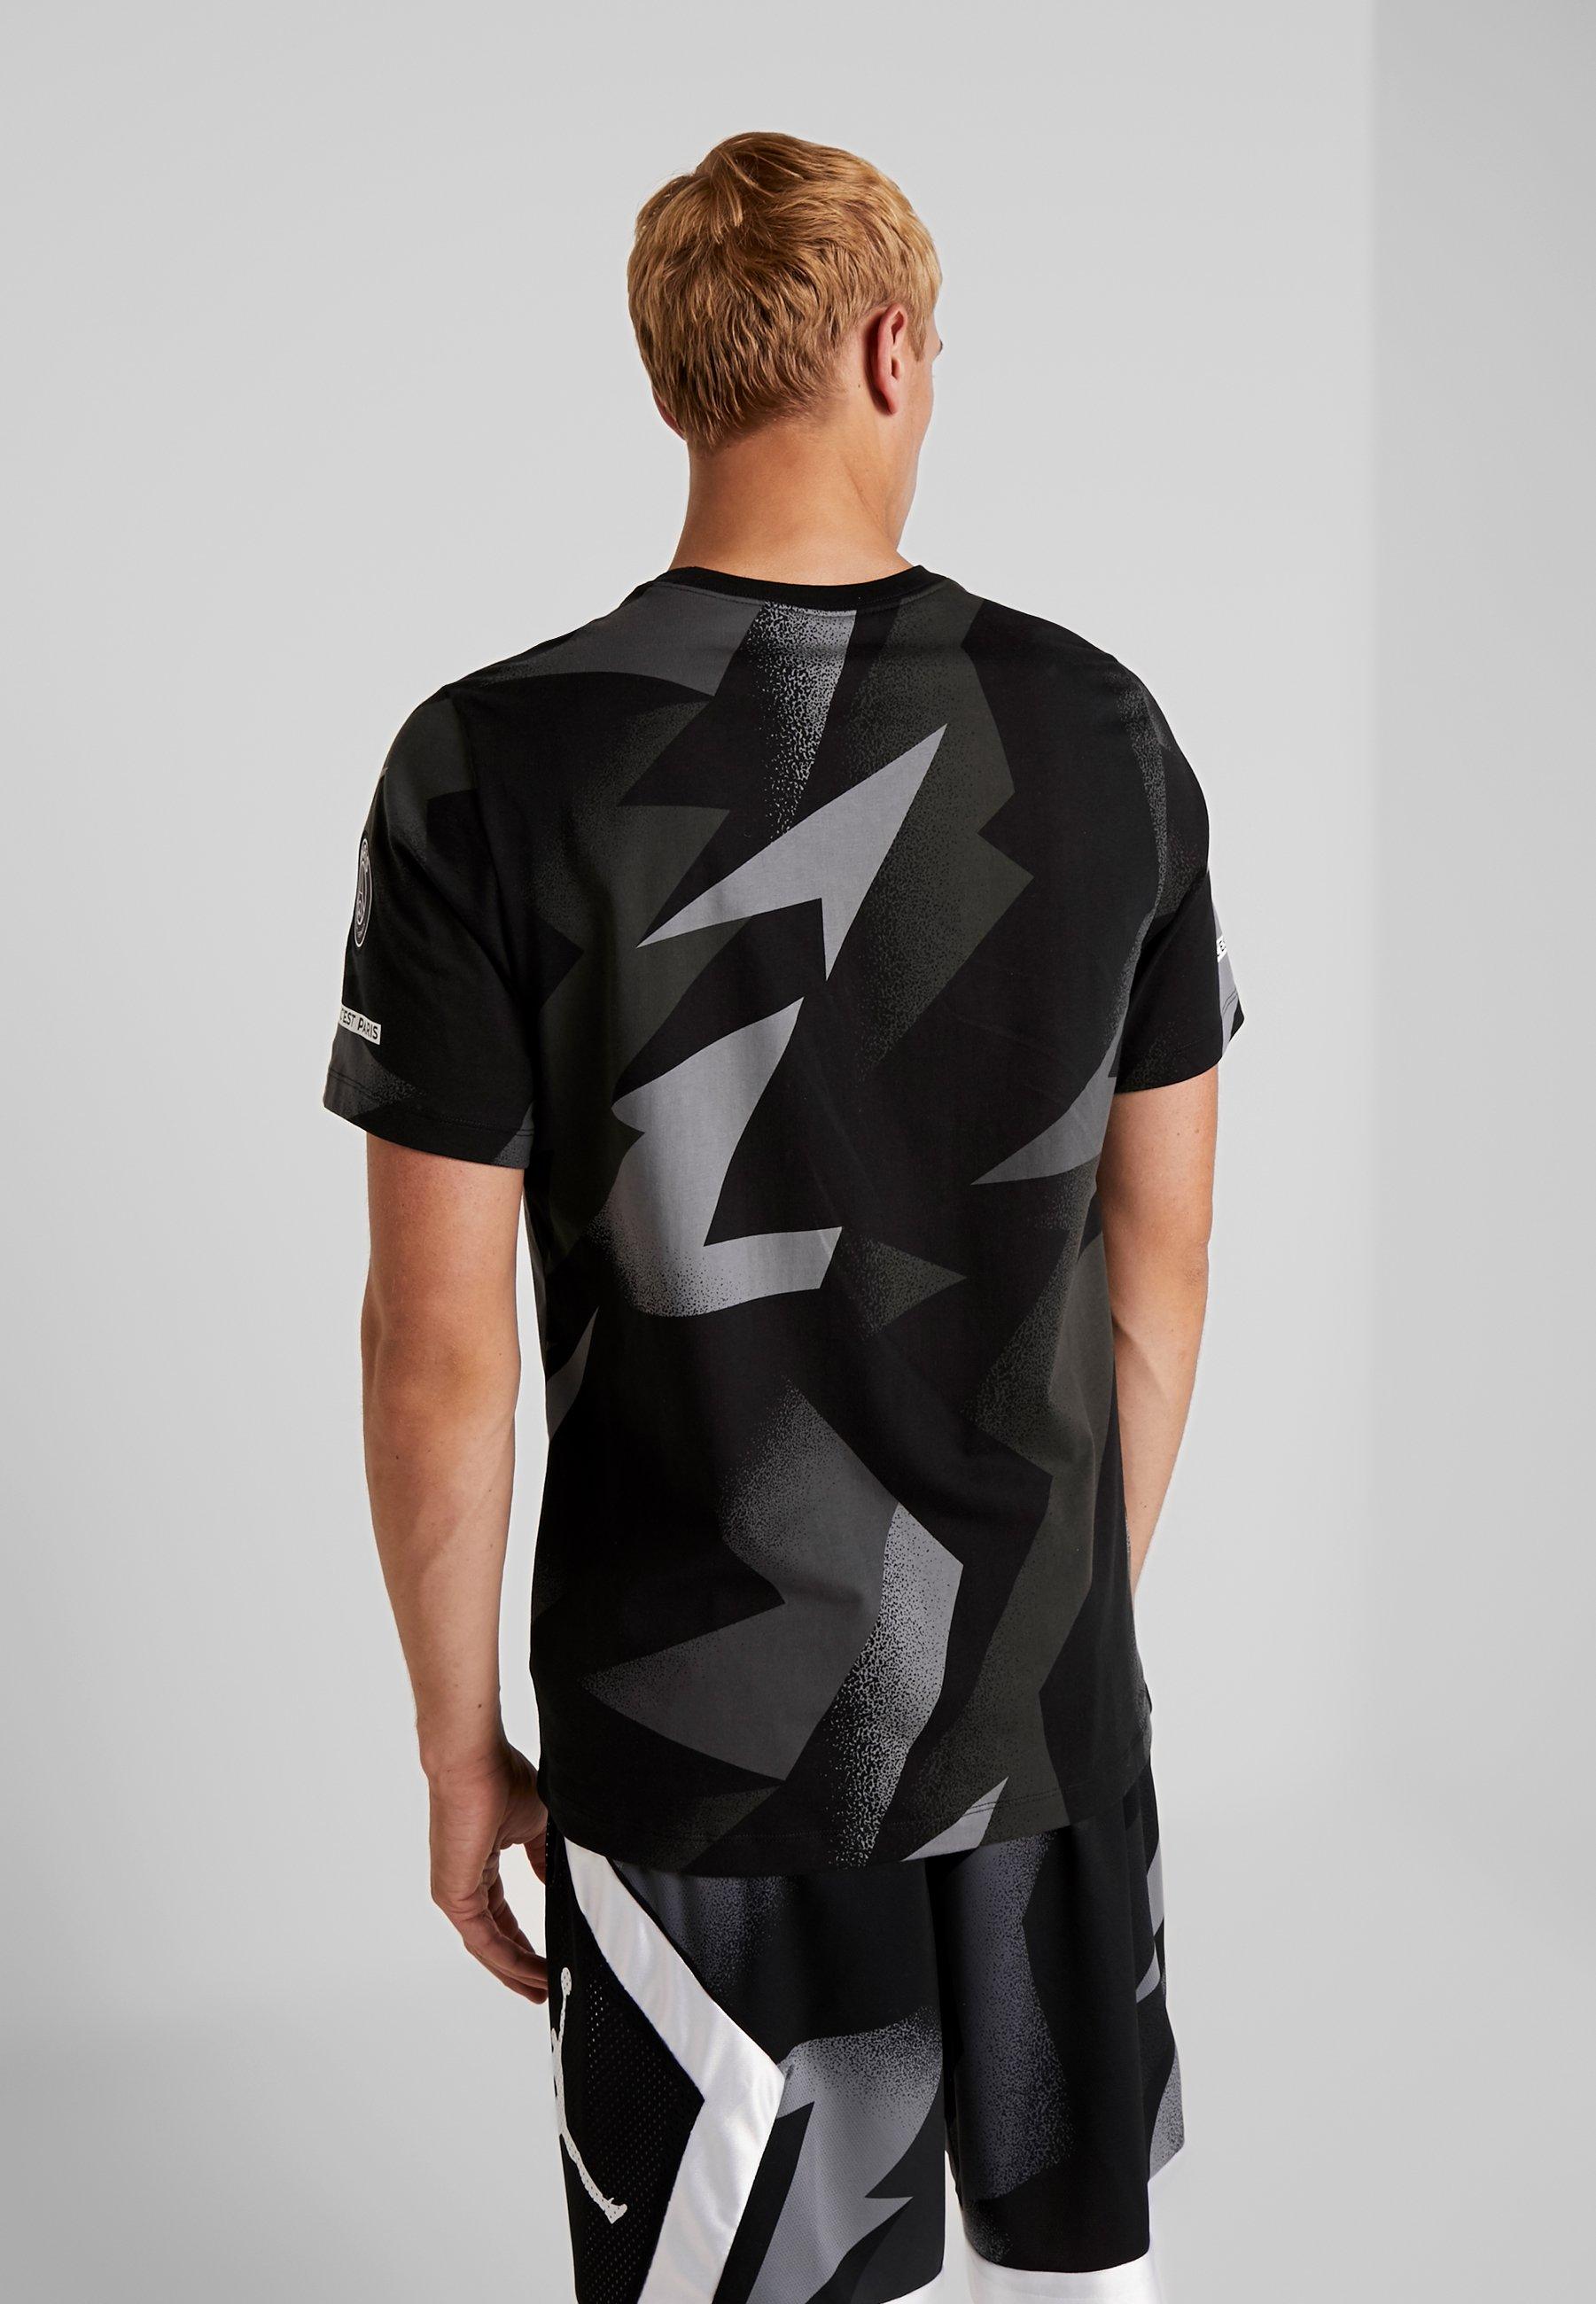 Imprimé Cat Performance Tag Nike Black TeeT Fc Jock shirt fvYb76gIym